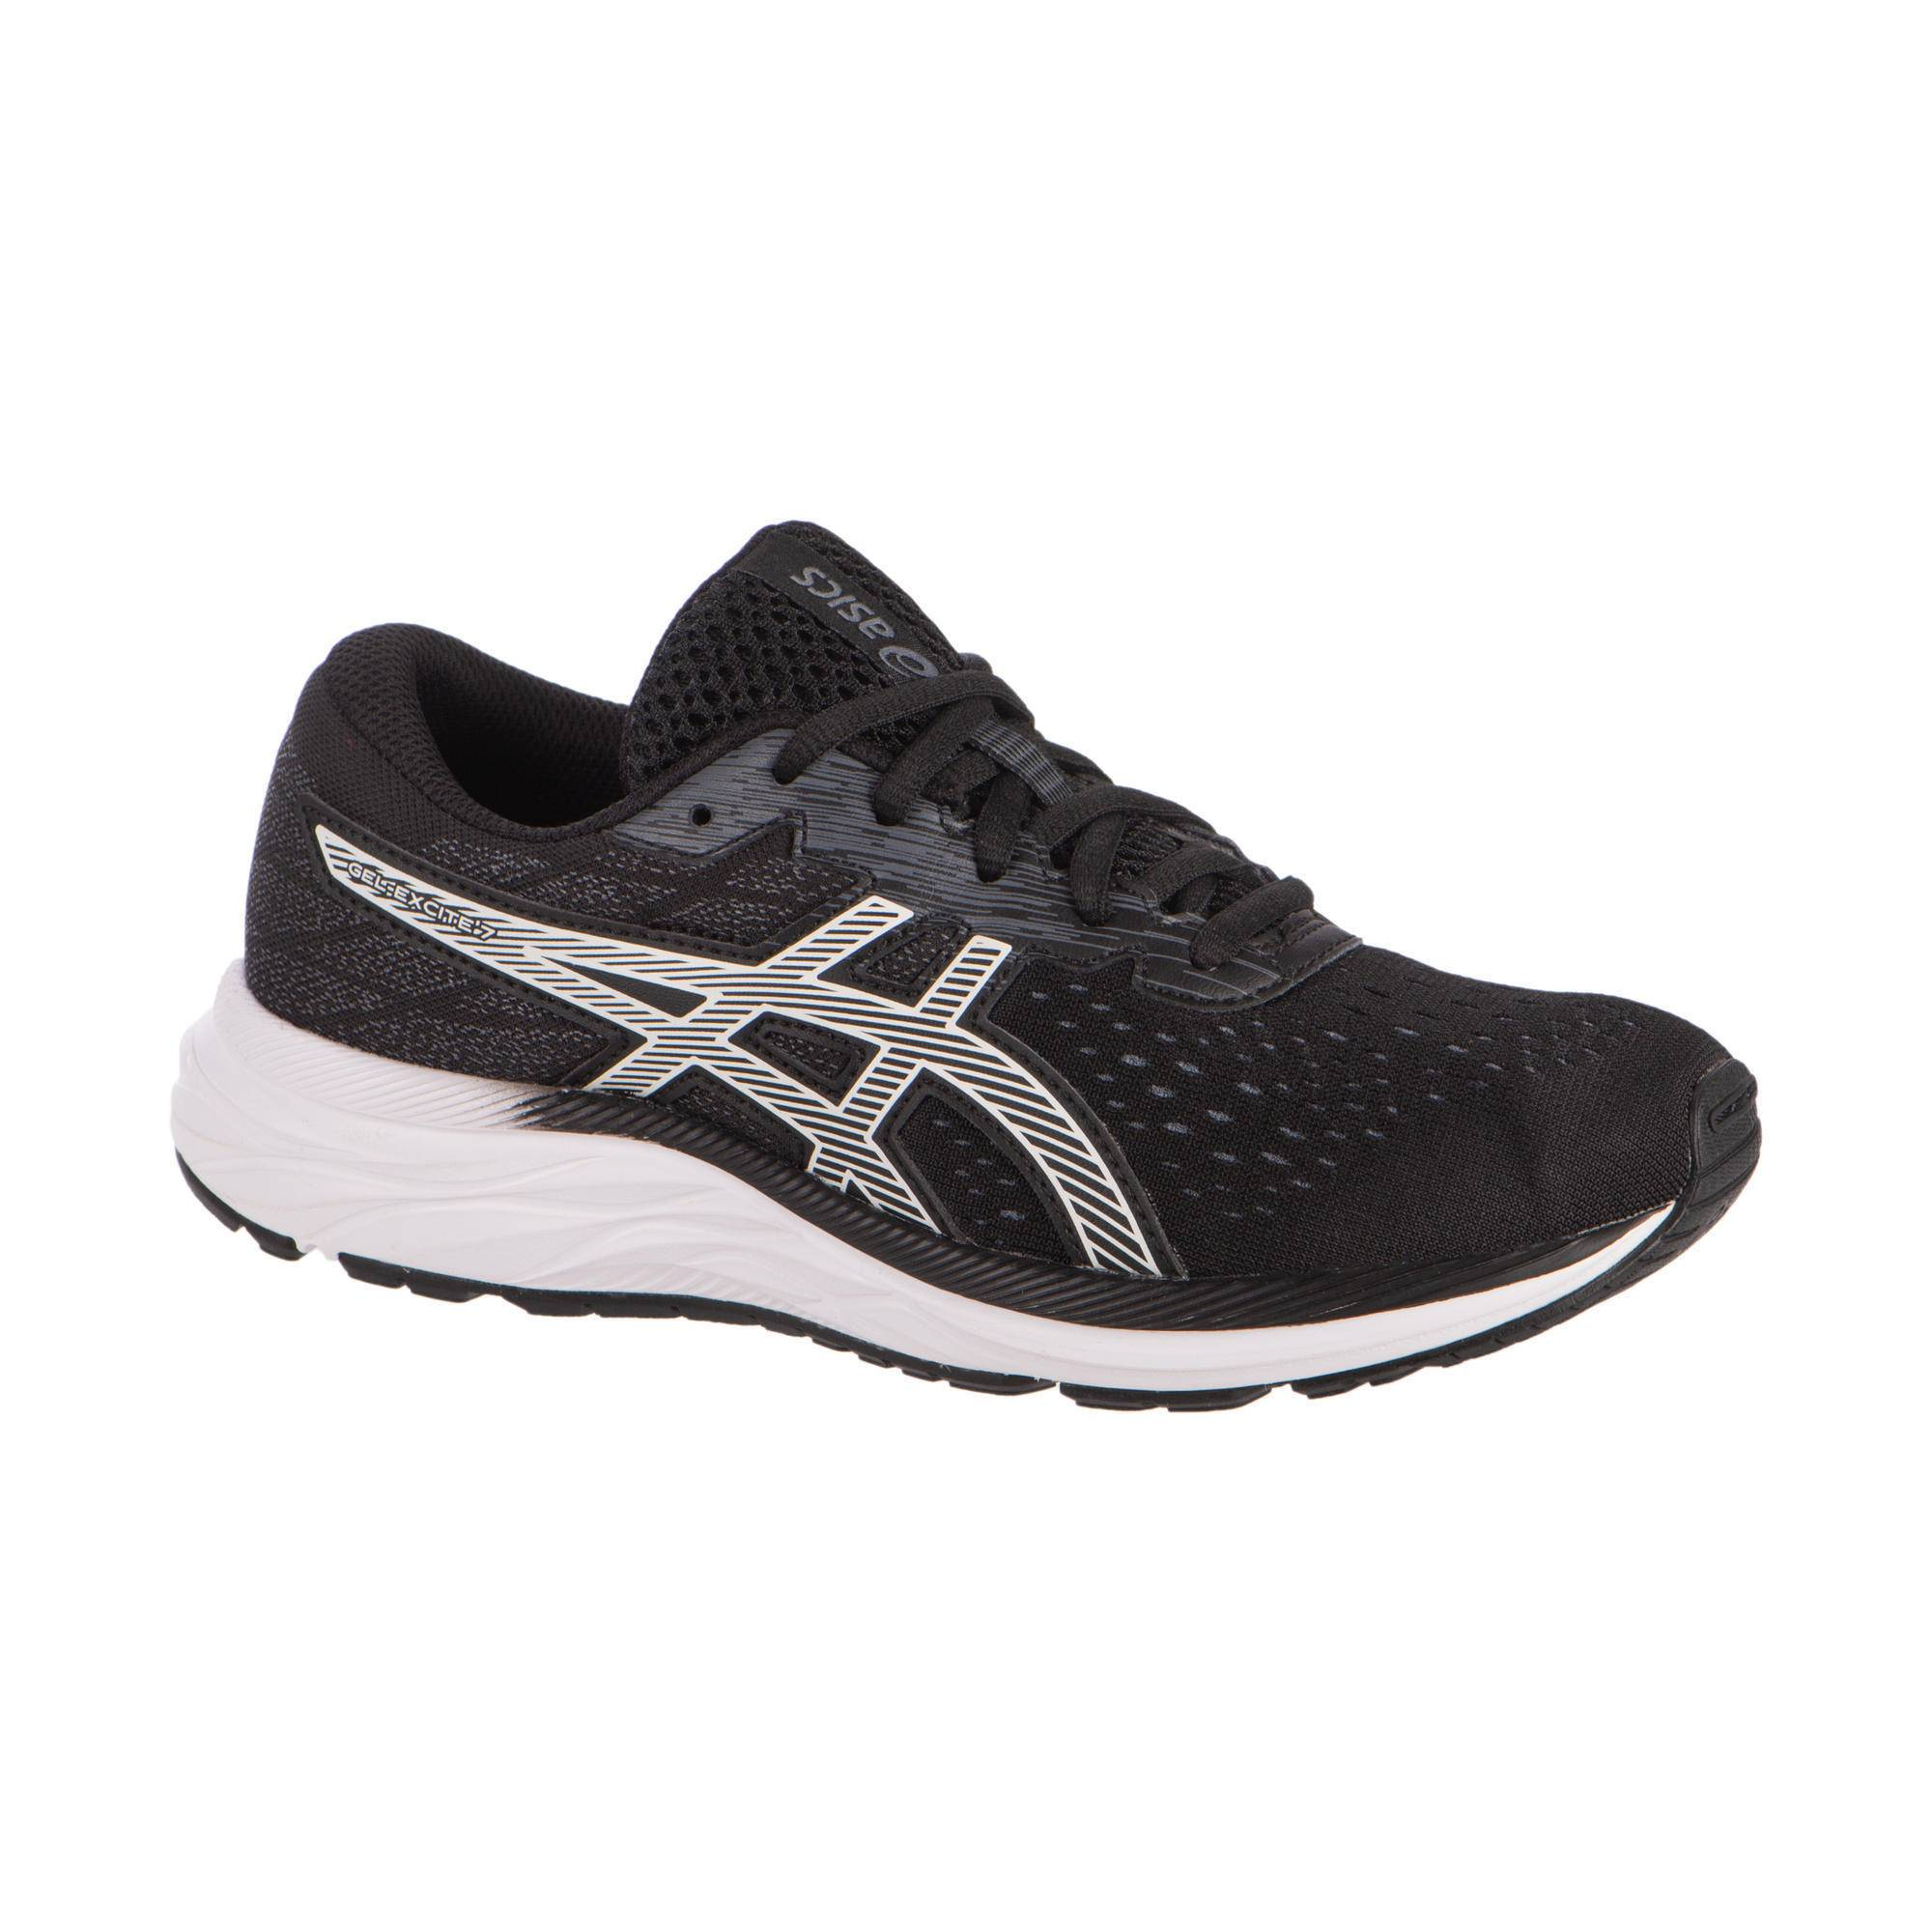 ASICS Chaussure athlétisme enfant Gel Excite. - ASICS - 39